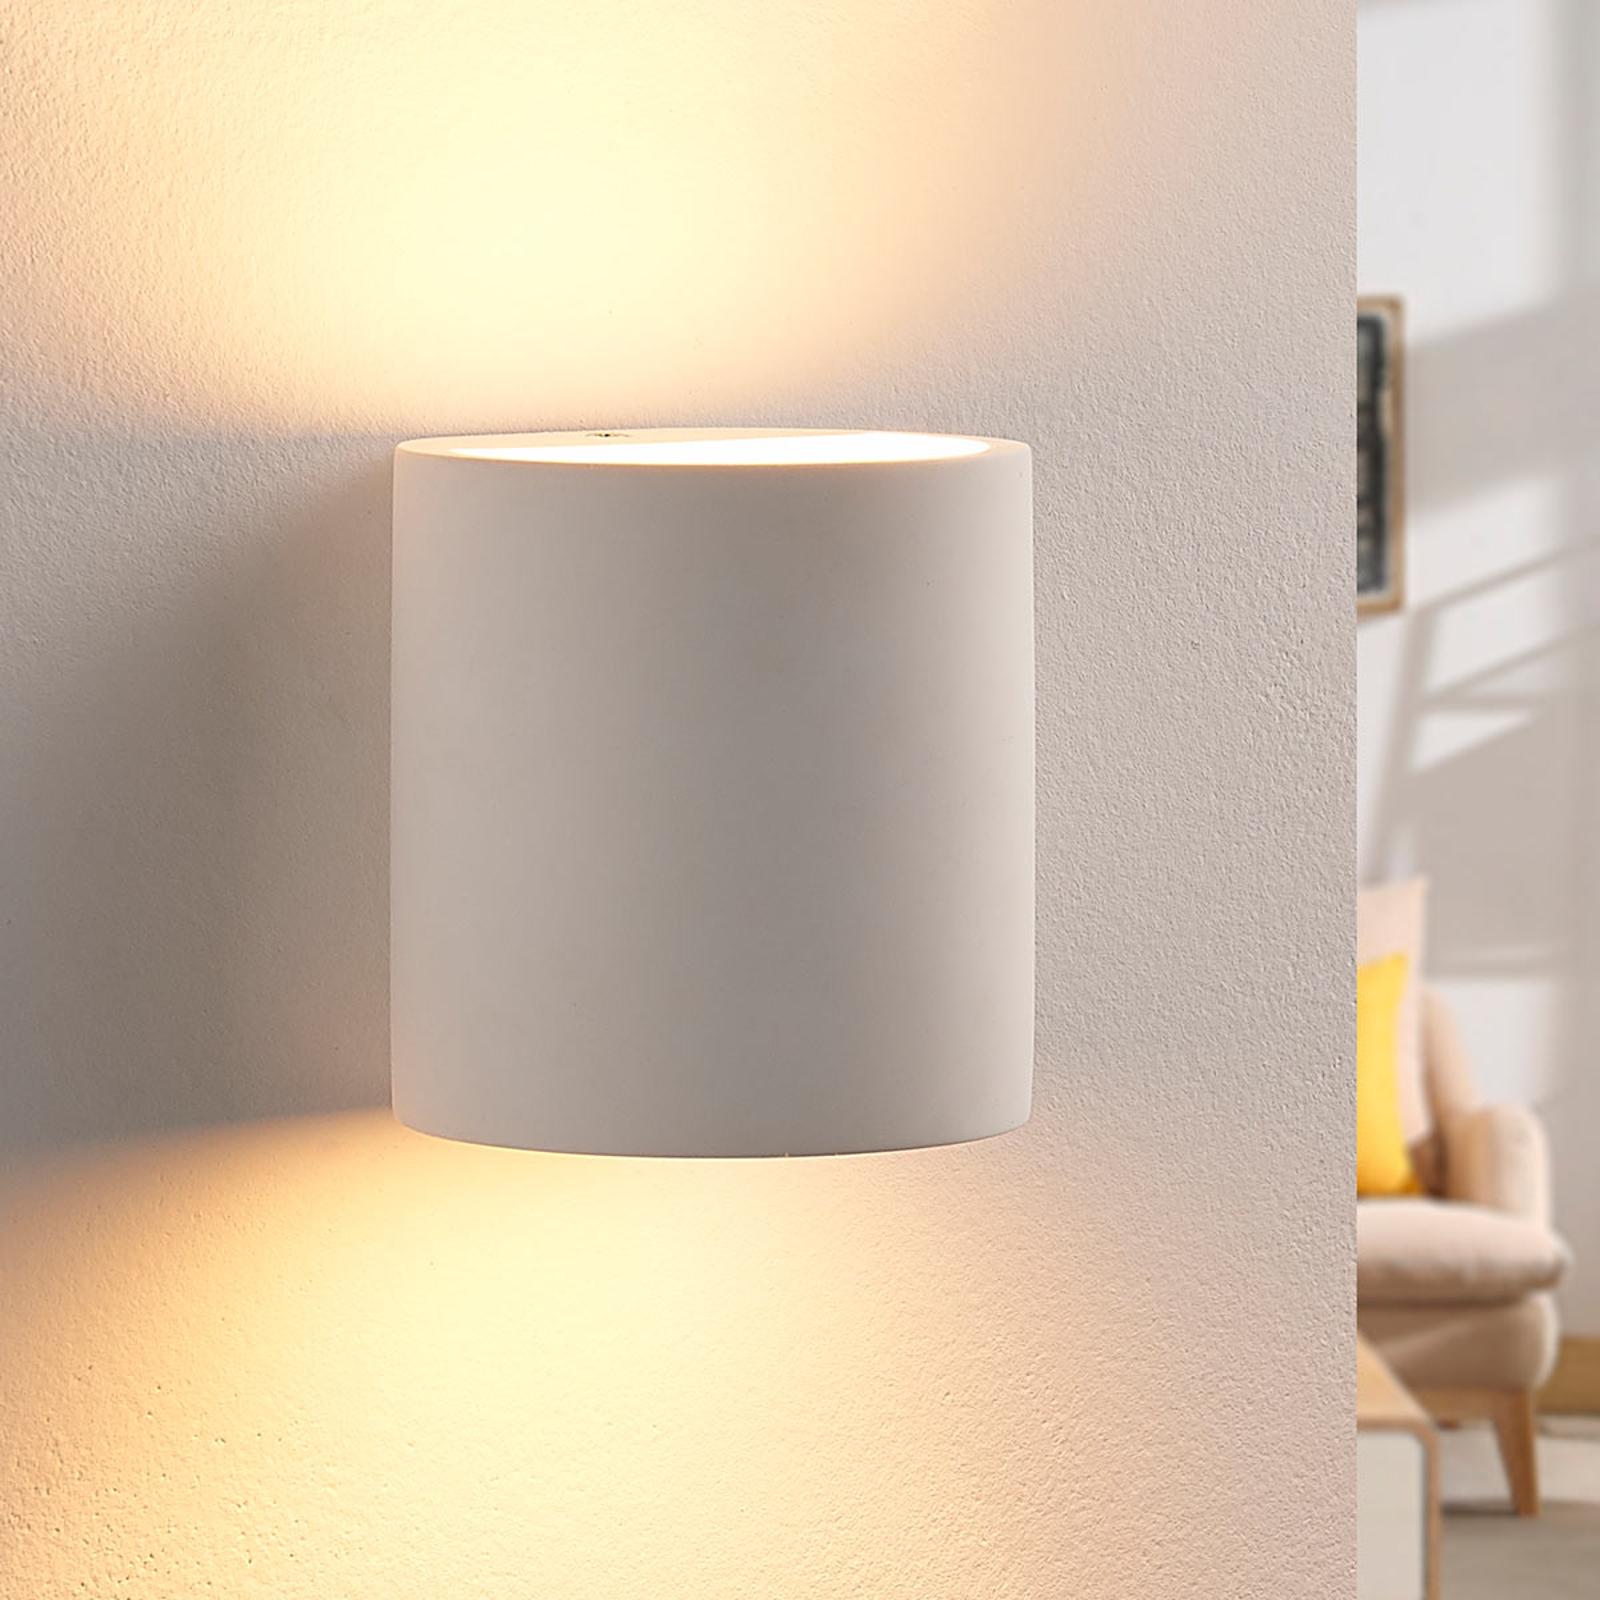 Gipswandleuchte Krista mit G9-LED-Lampe